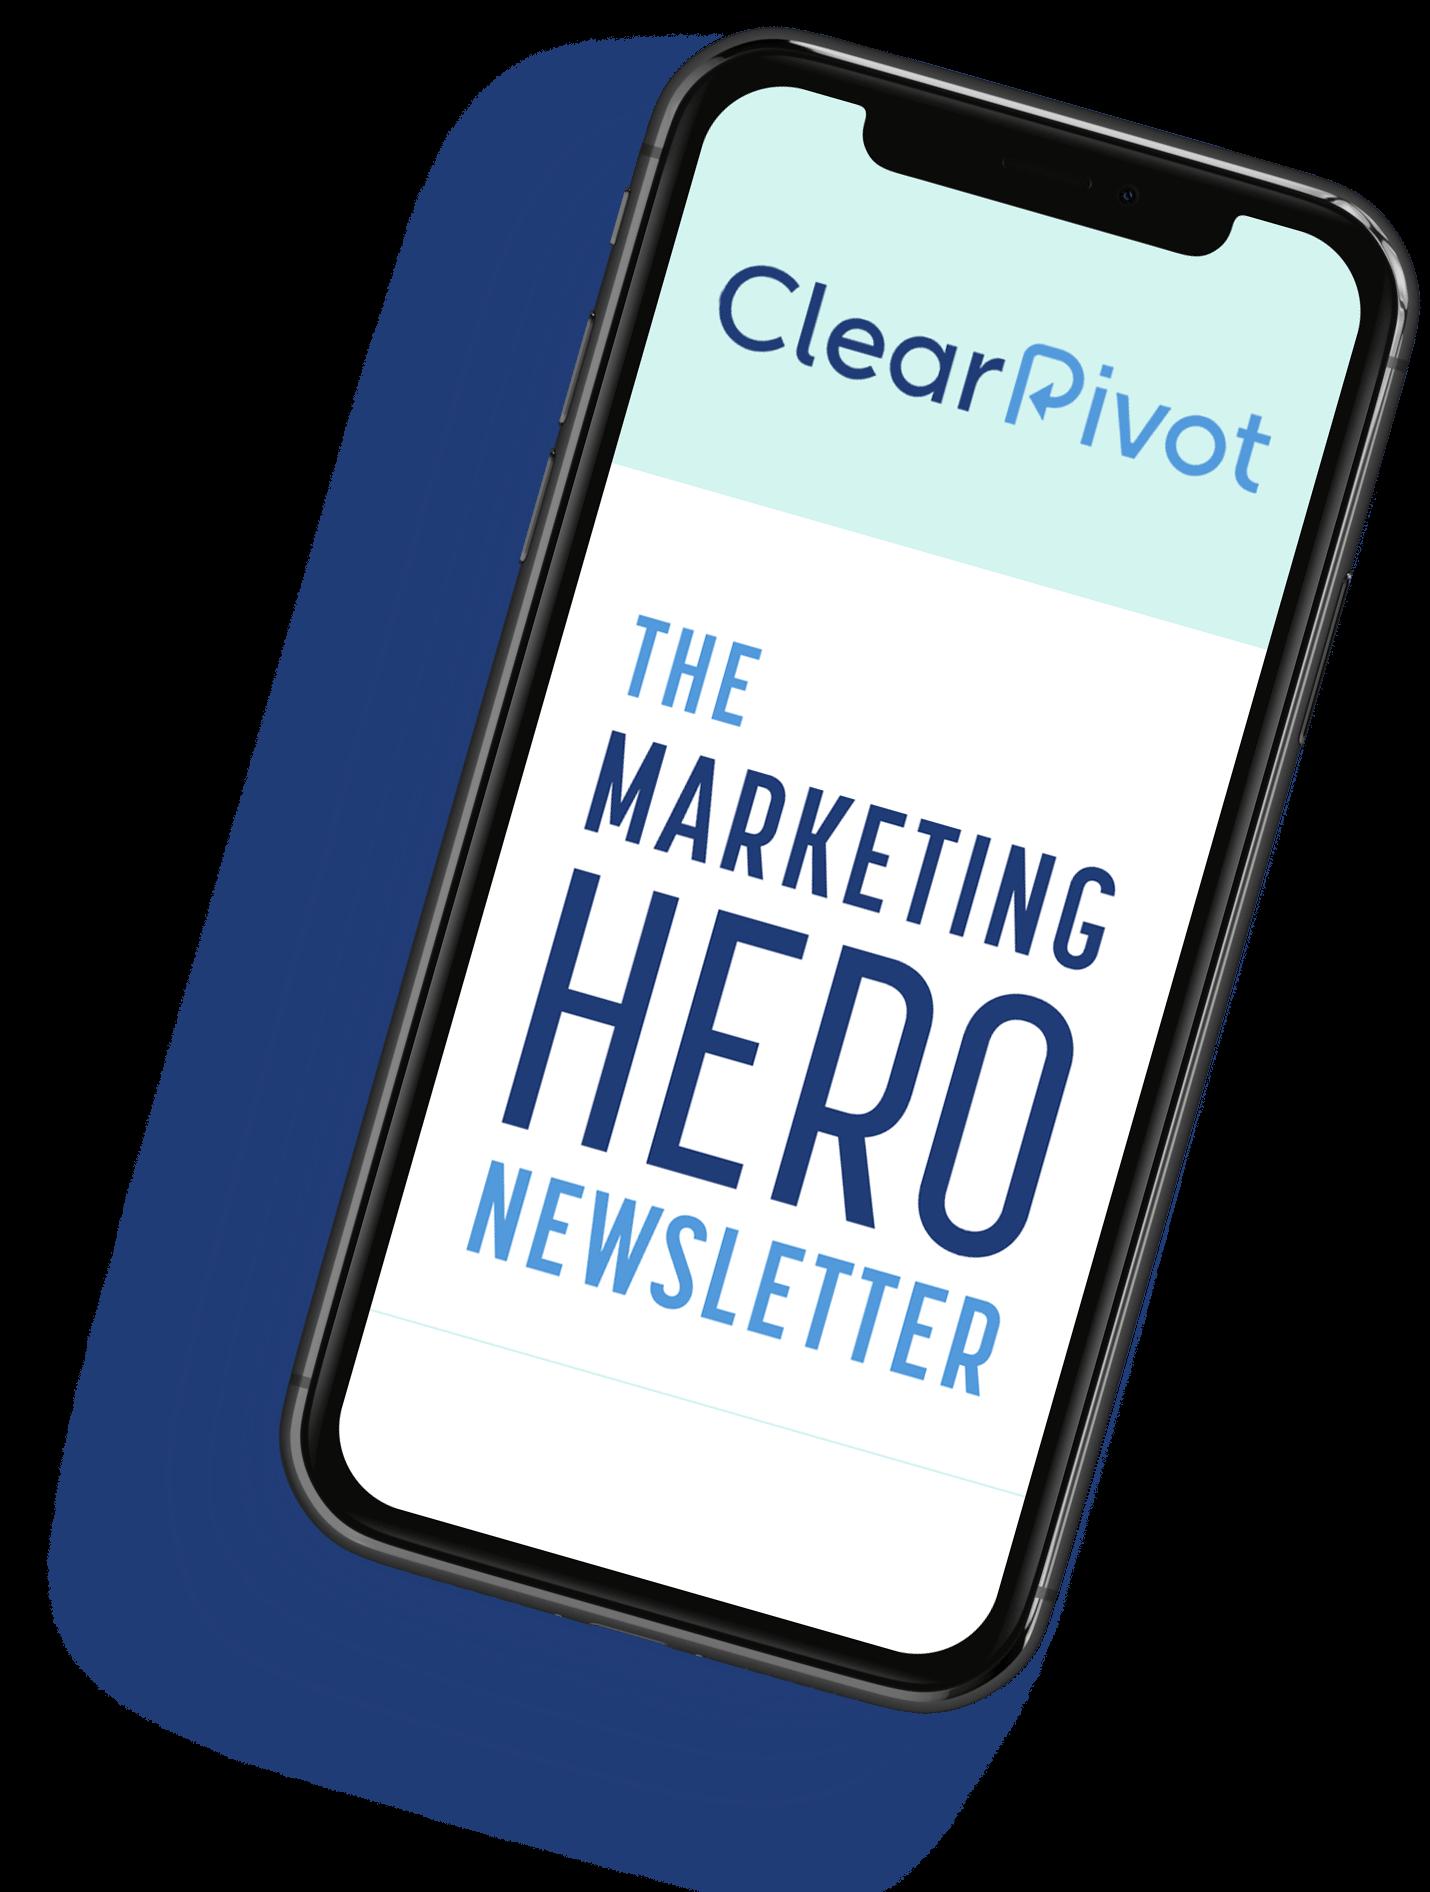 Marketing-Heroes-iphone 2